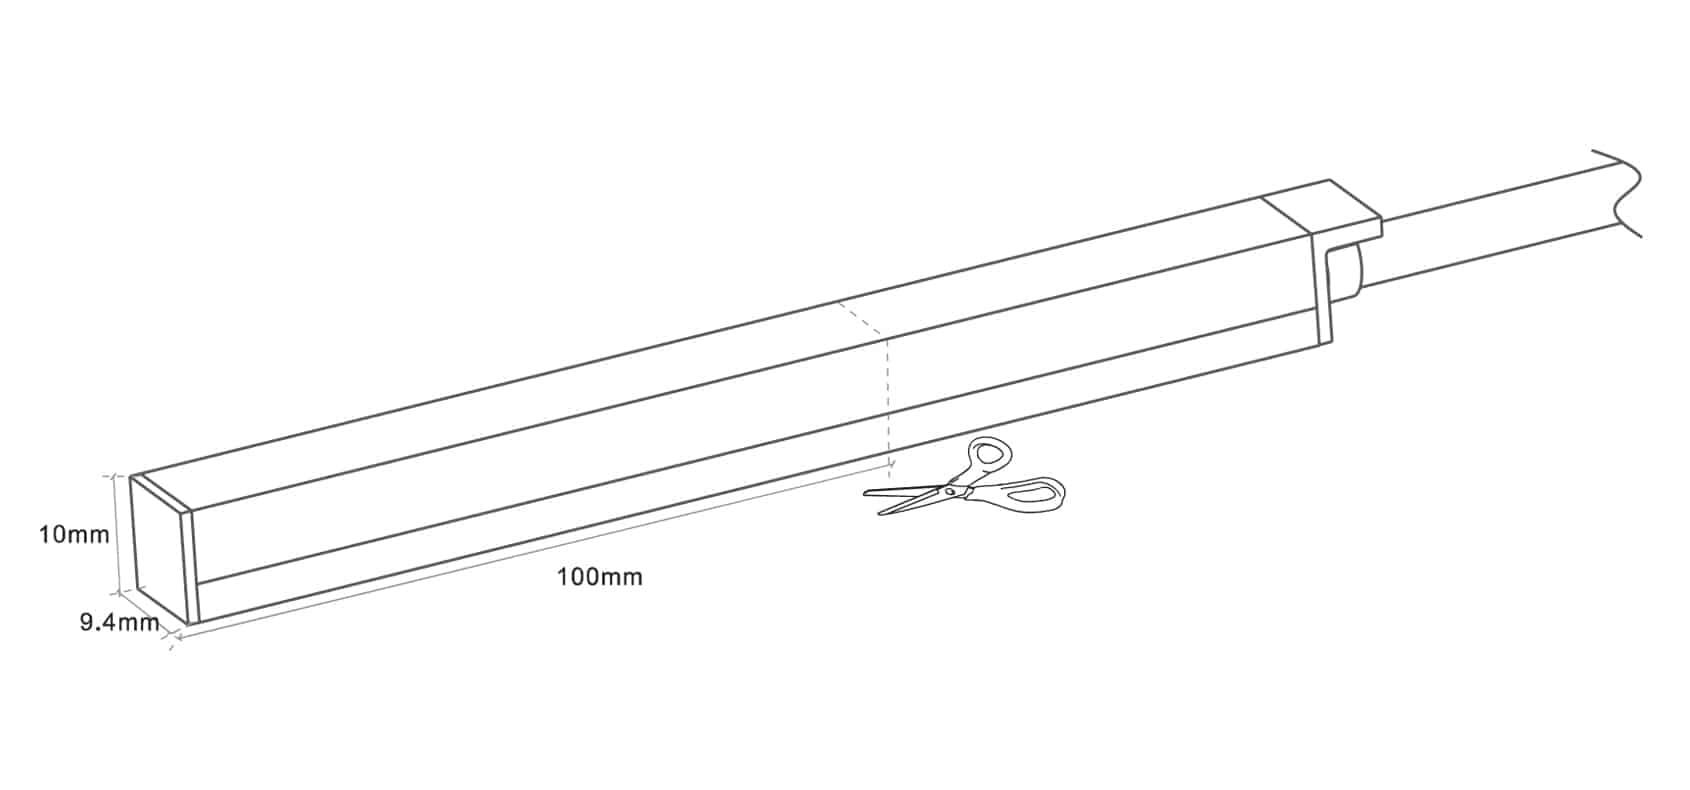 Neon-Flex-Slim Top Bend - 9.4x10mm - Tunable & RGB - Dia